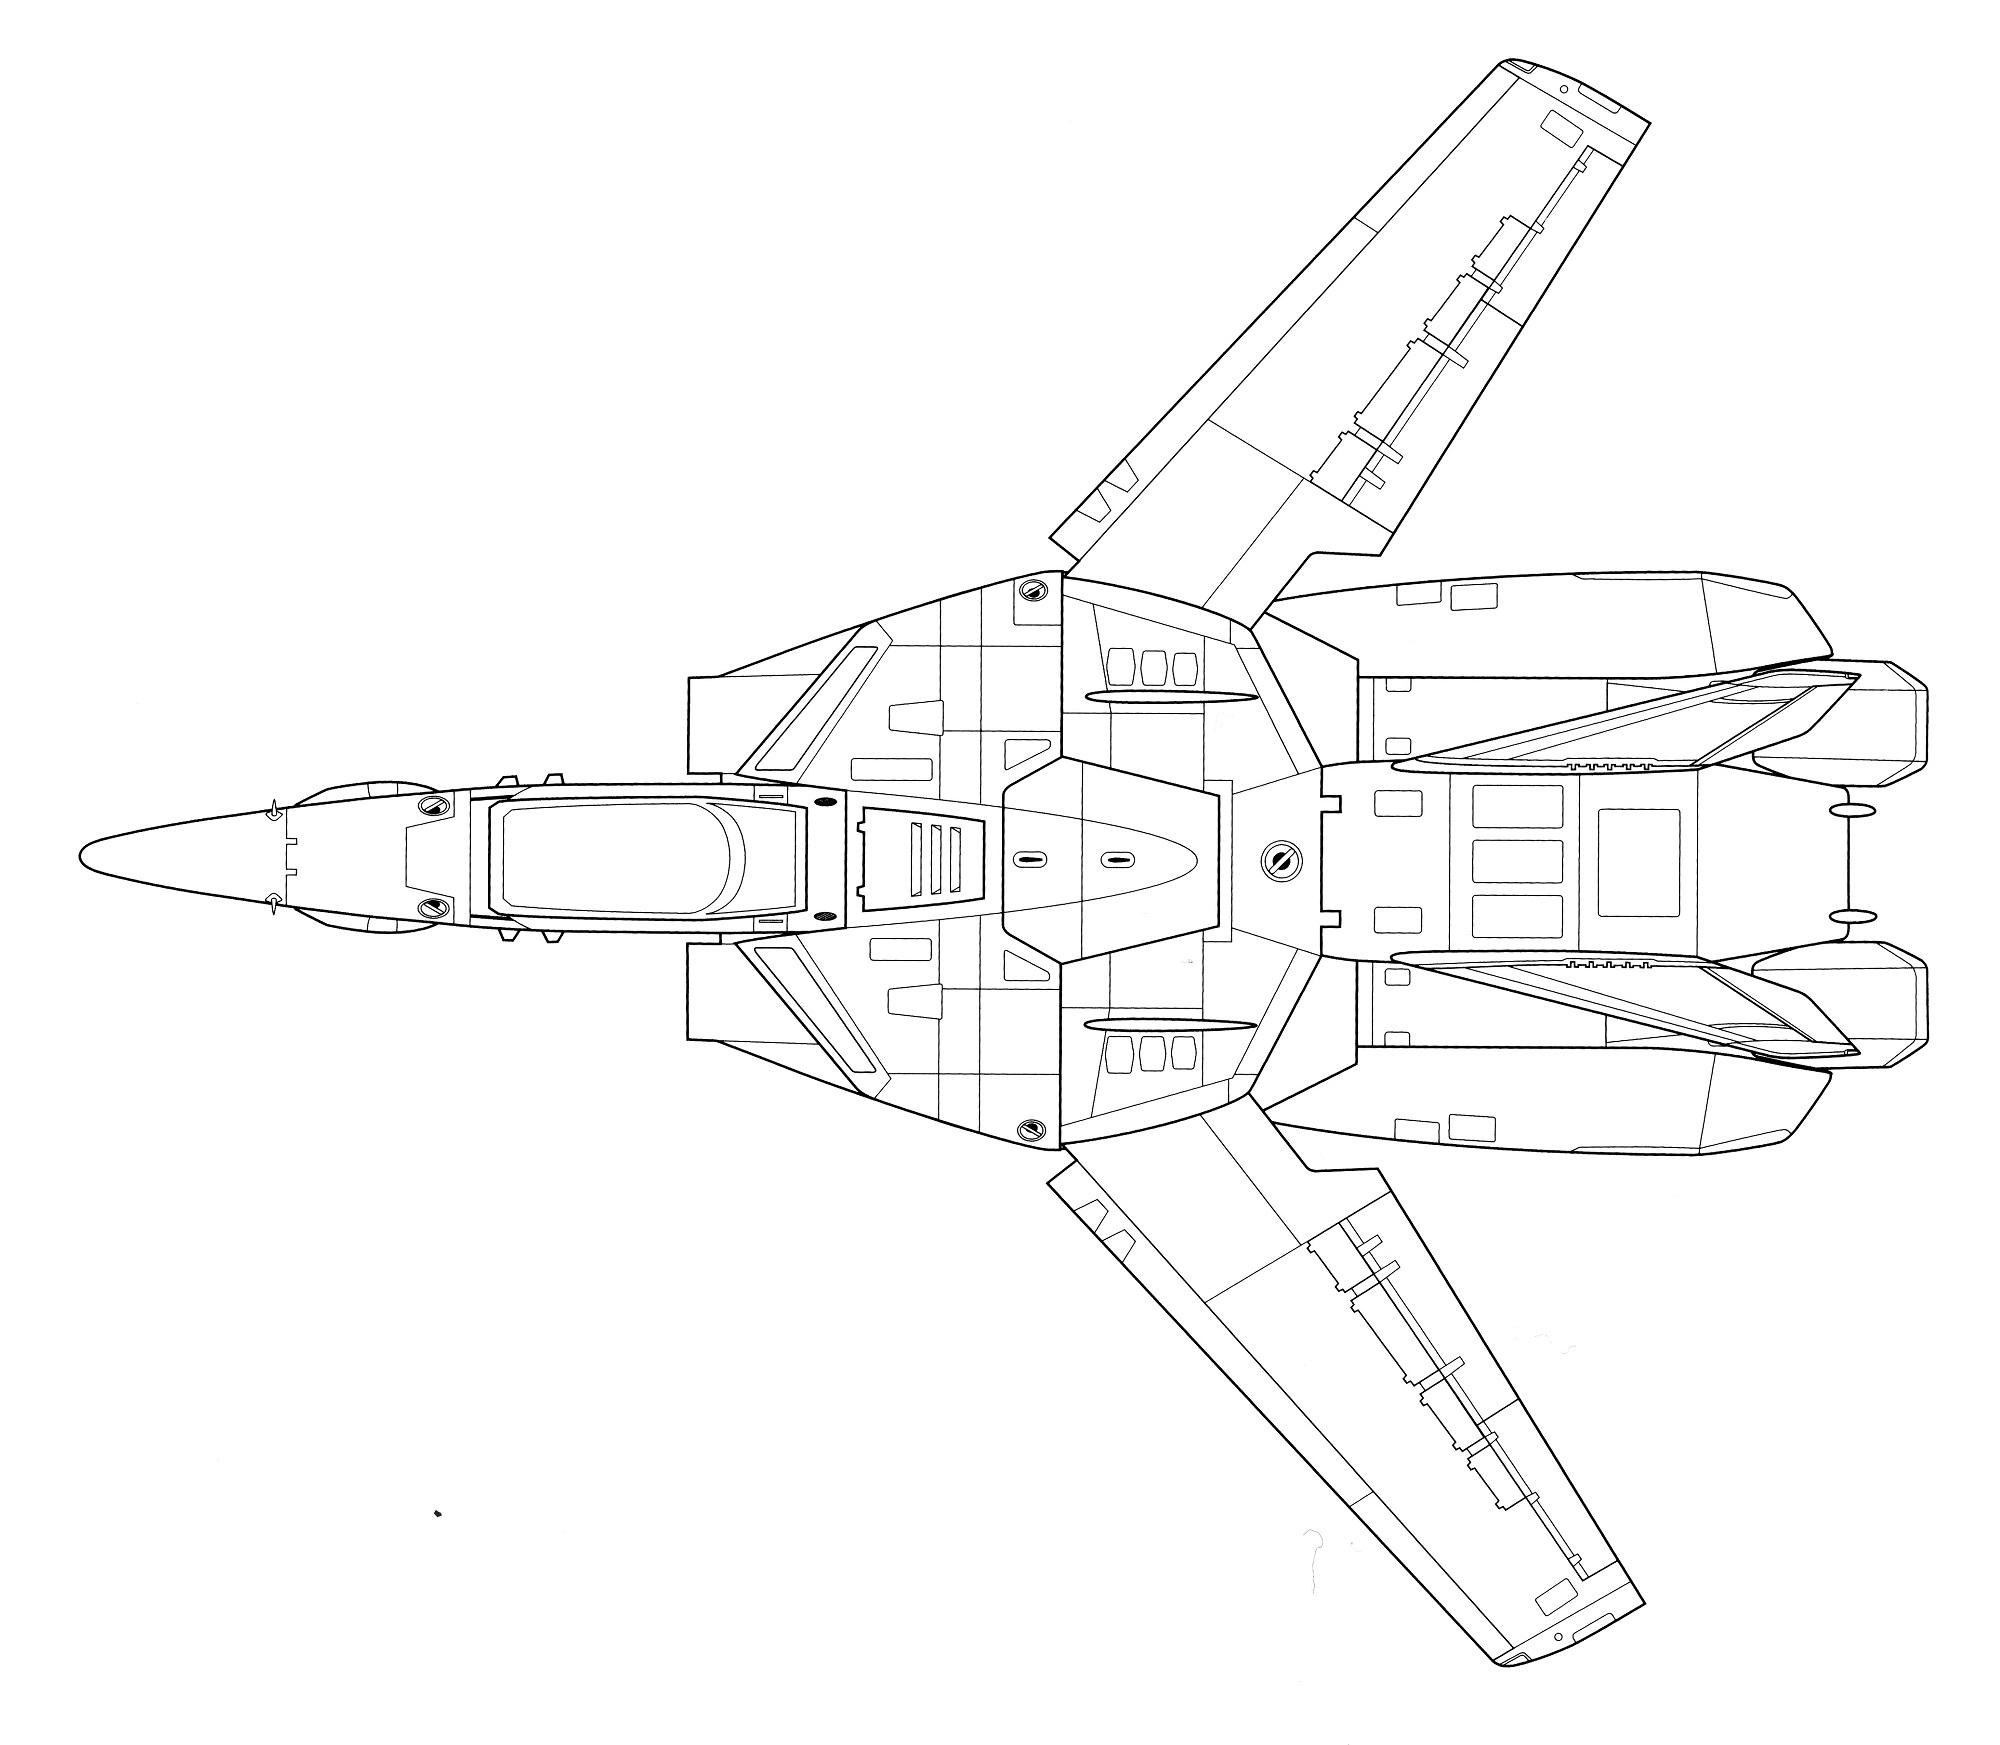 Dorkspeed mecha journal page 49 version 1 fast pack vf 1a valkyrie veritech 4 49 v f 1 engine diagram v f 1 engine diagram